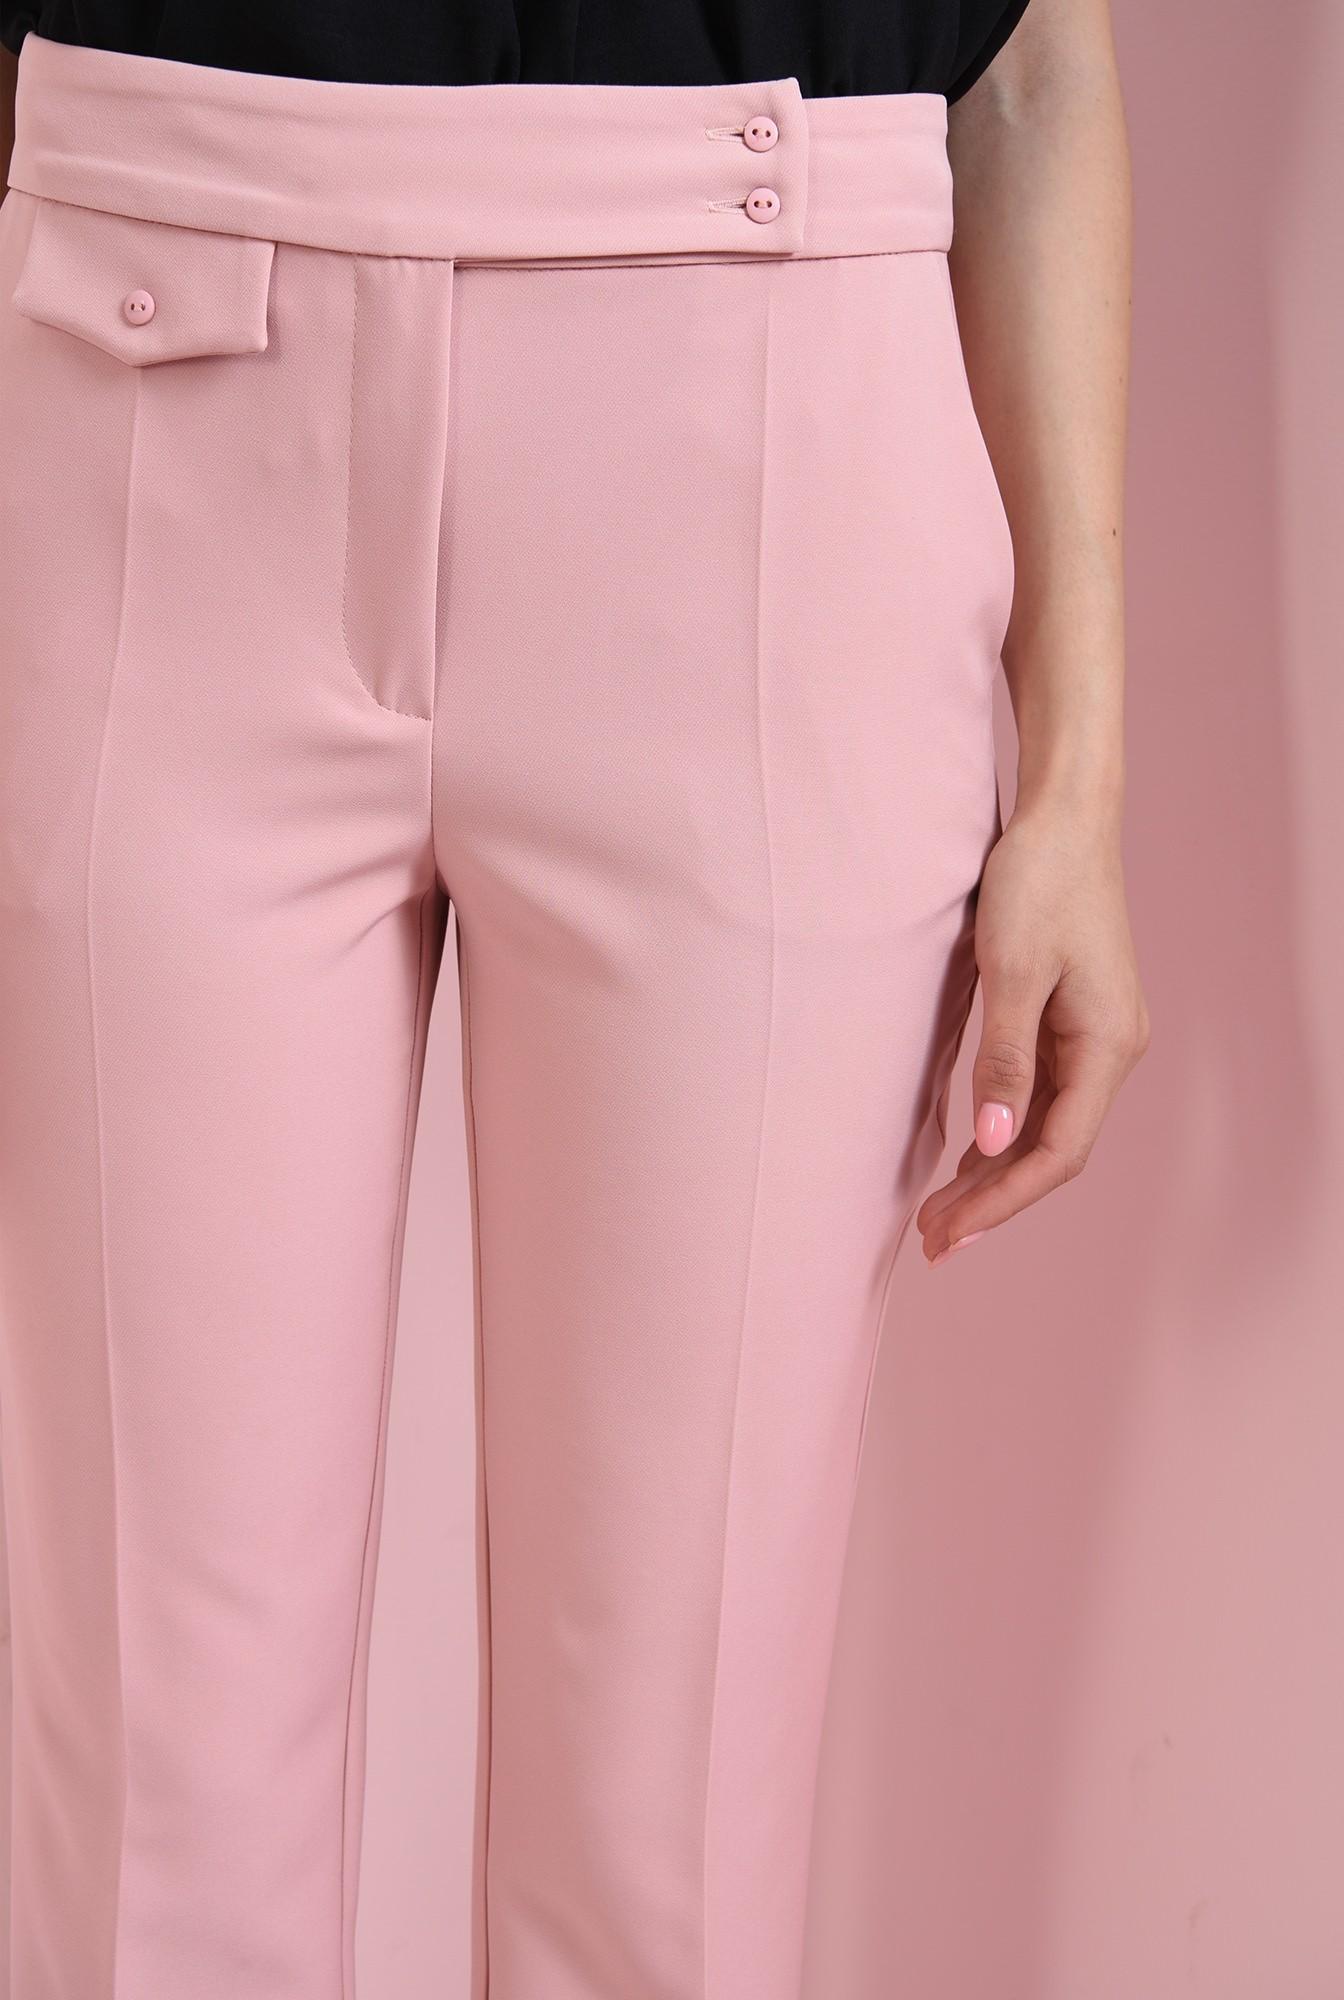 2 - pantaloni casual, roz, cu buzunar decorativ